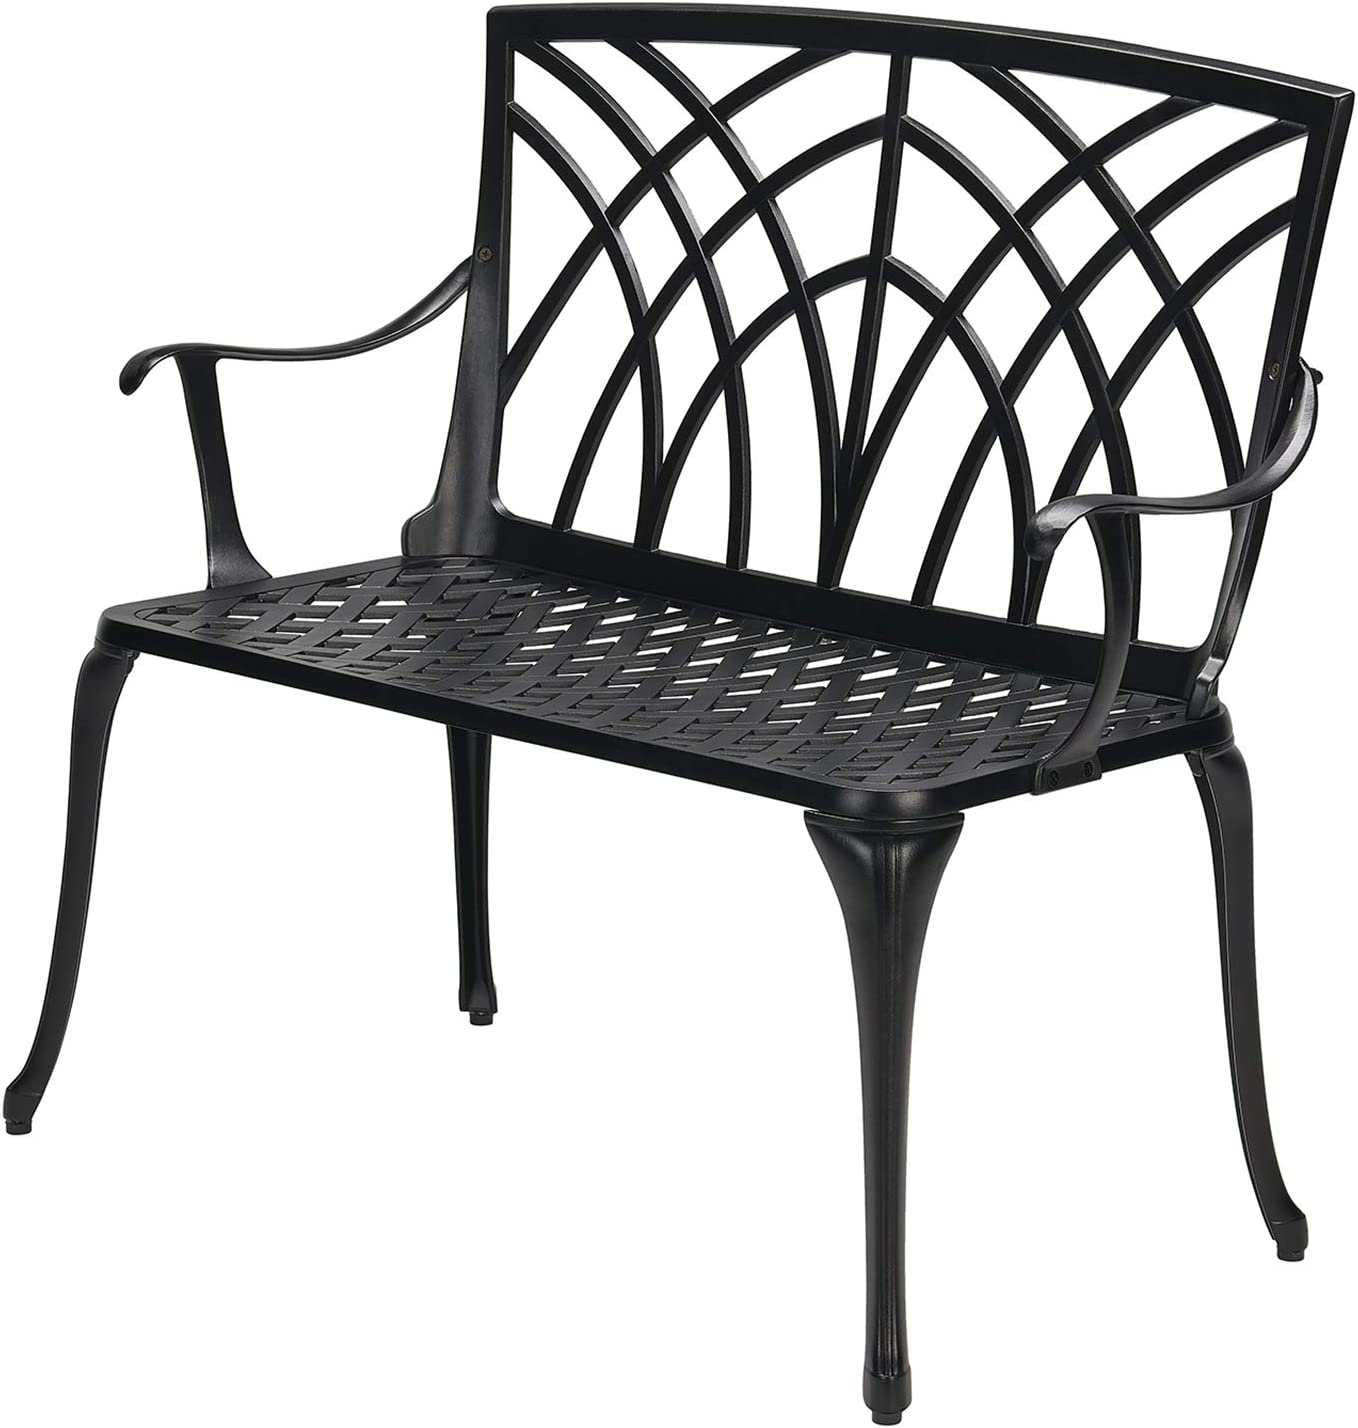 "Laurel Canyon 38"" Outdoor Patio Bench, Cast Aluminum Construction Furniture Chair 2-Person Seating for Porch Backyard Garden Pool Deck, Black"